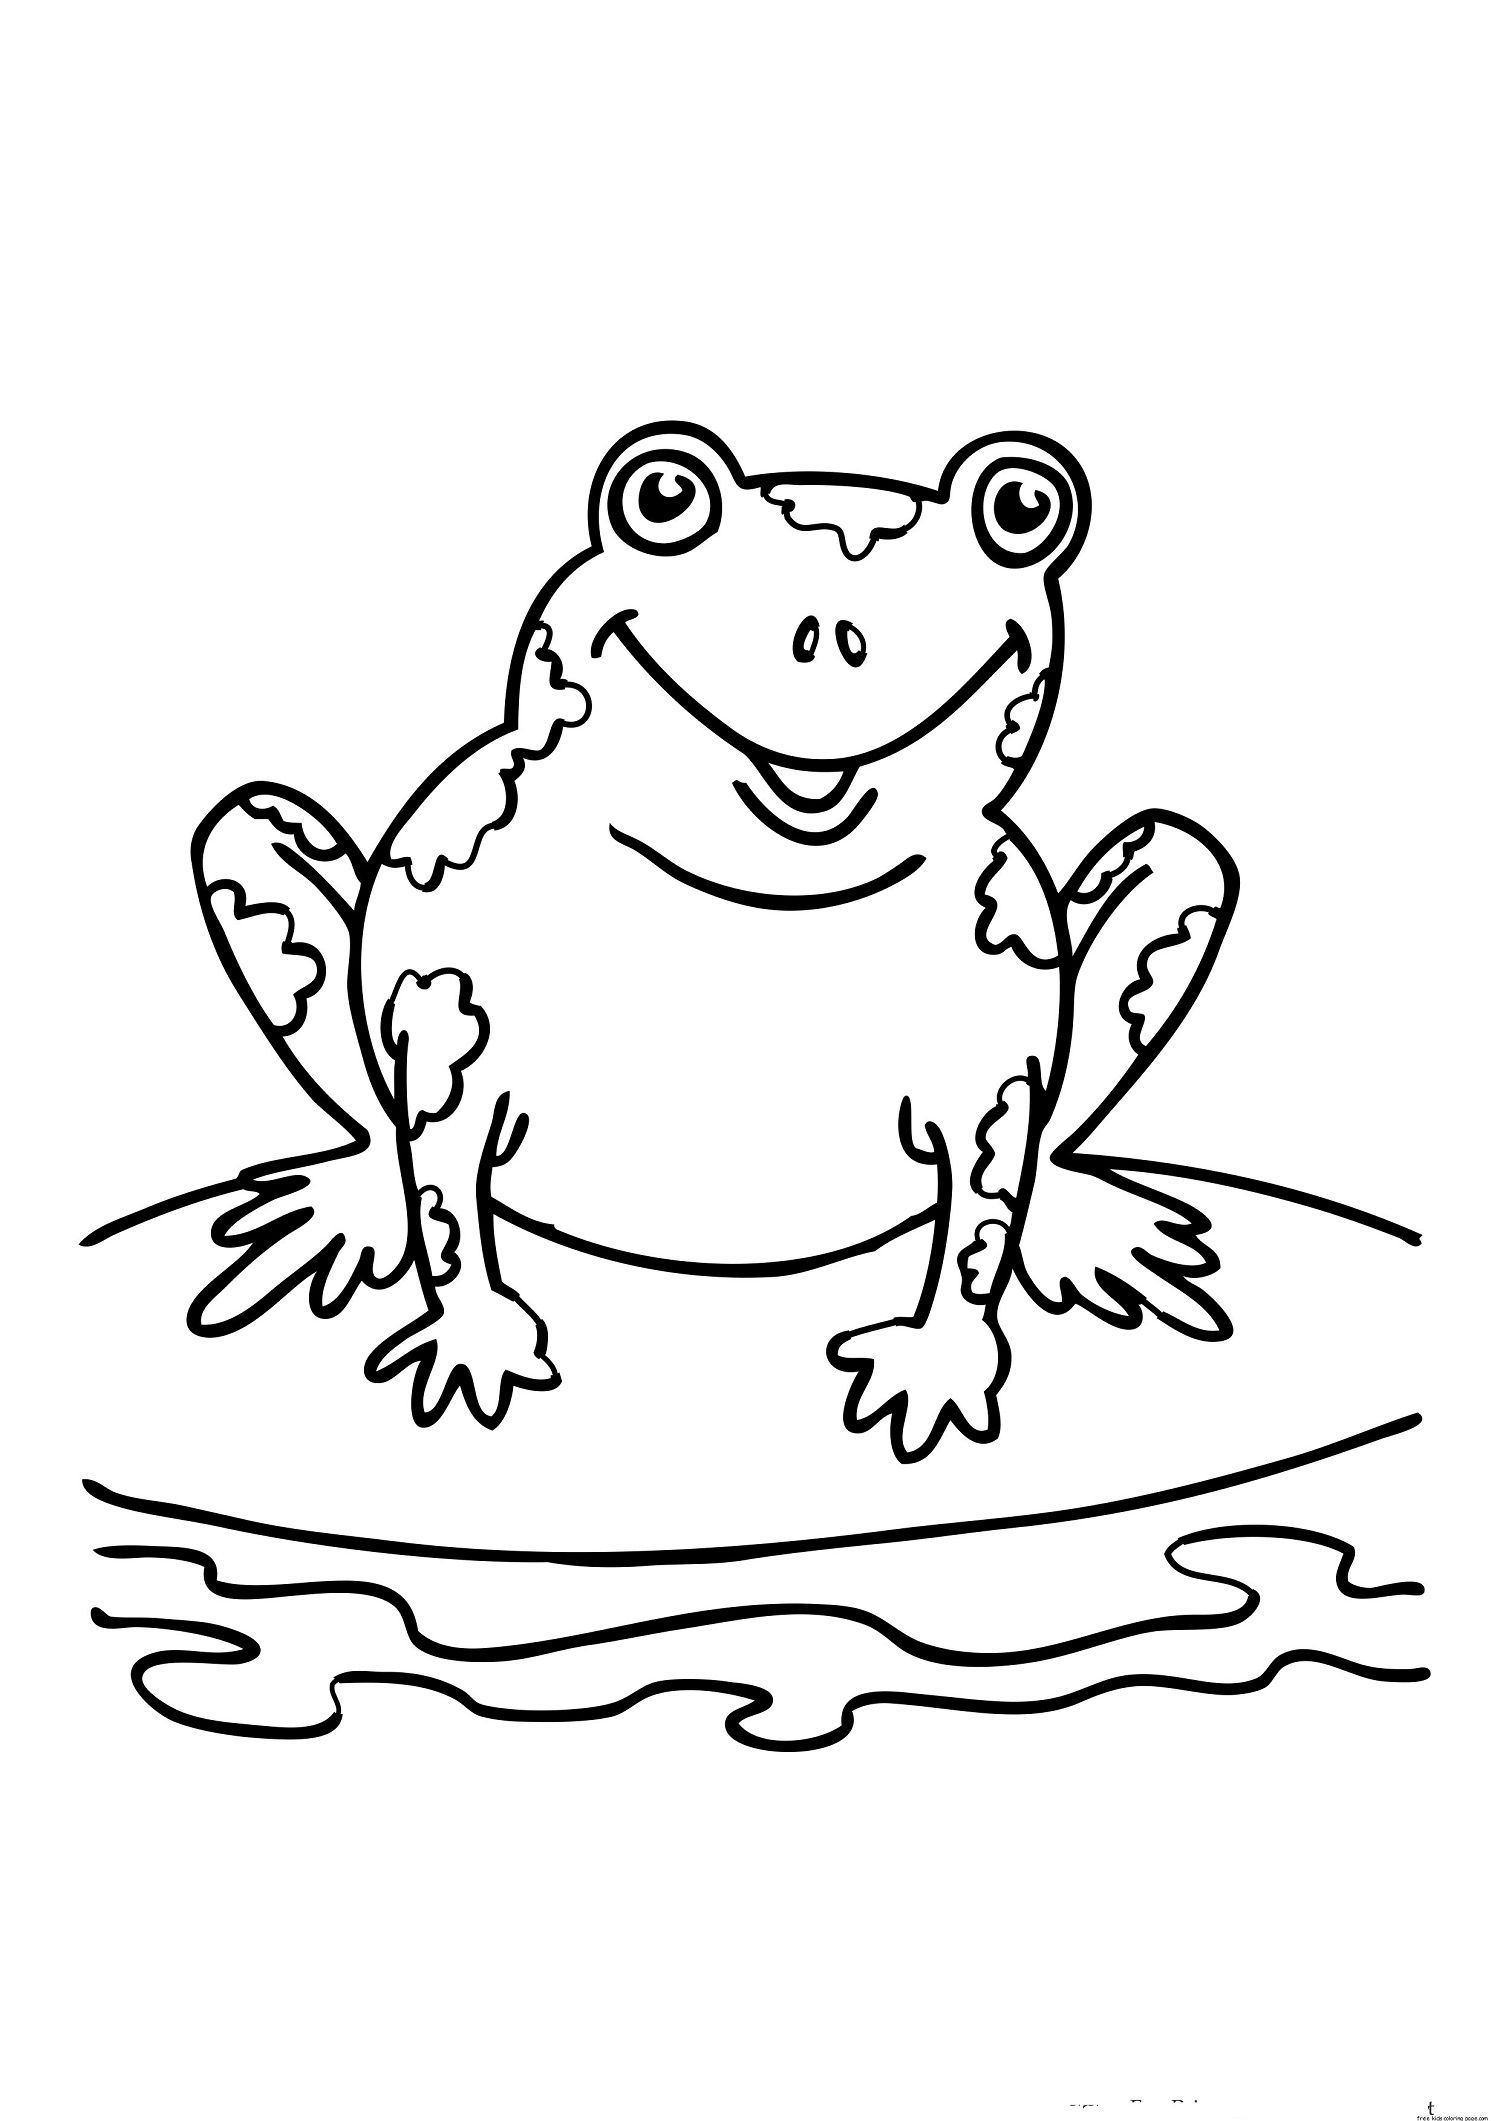 Amphibians Printable for Kids Kids Activity Coloring